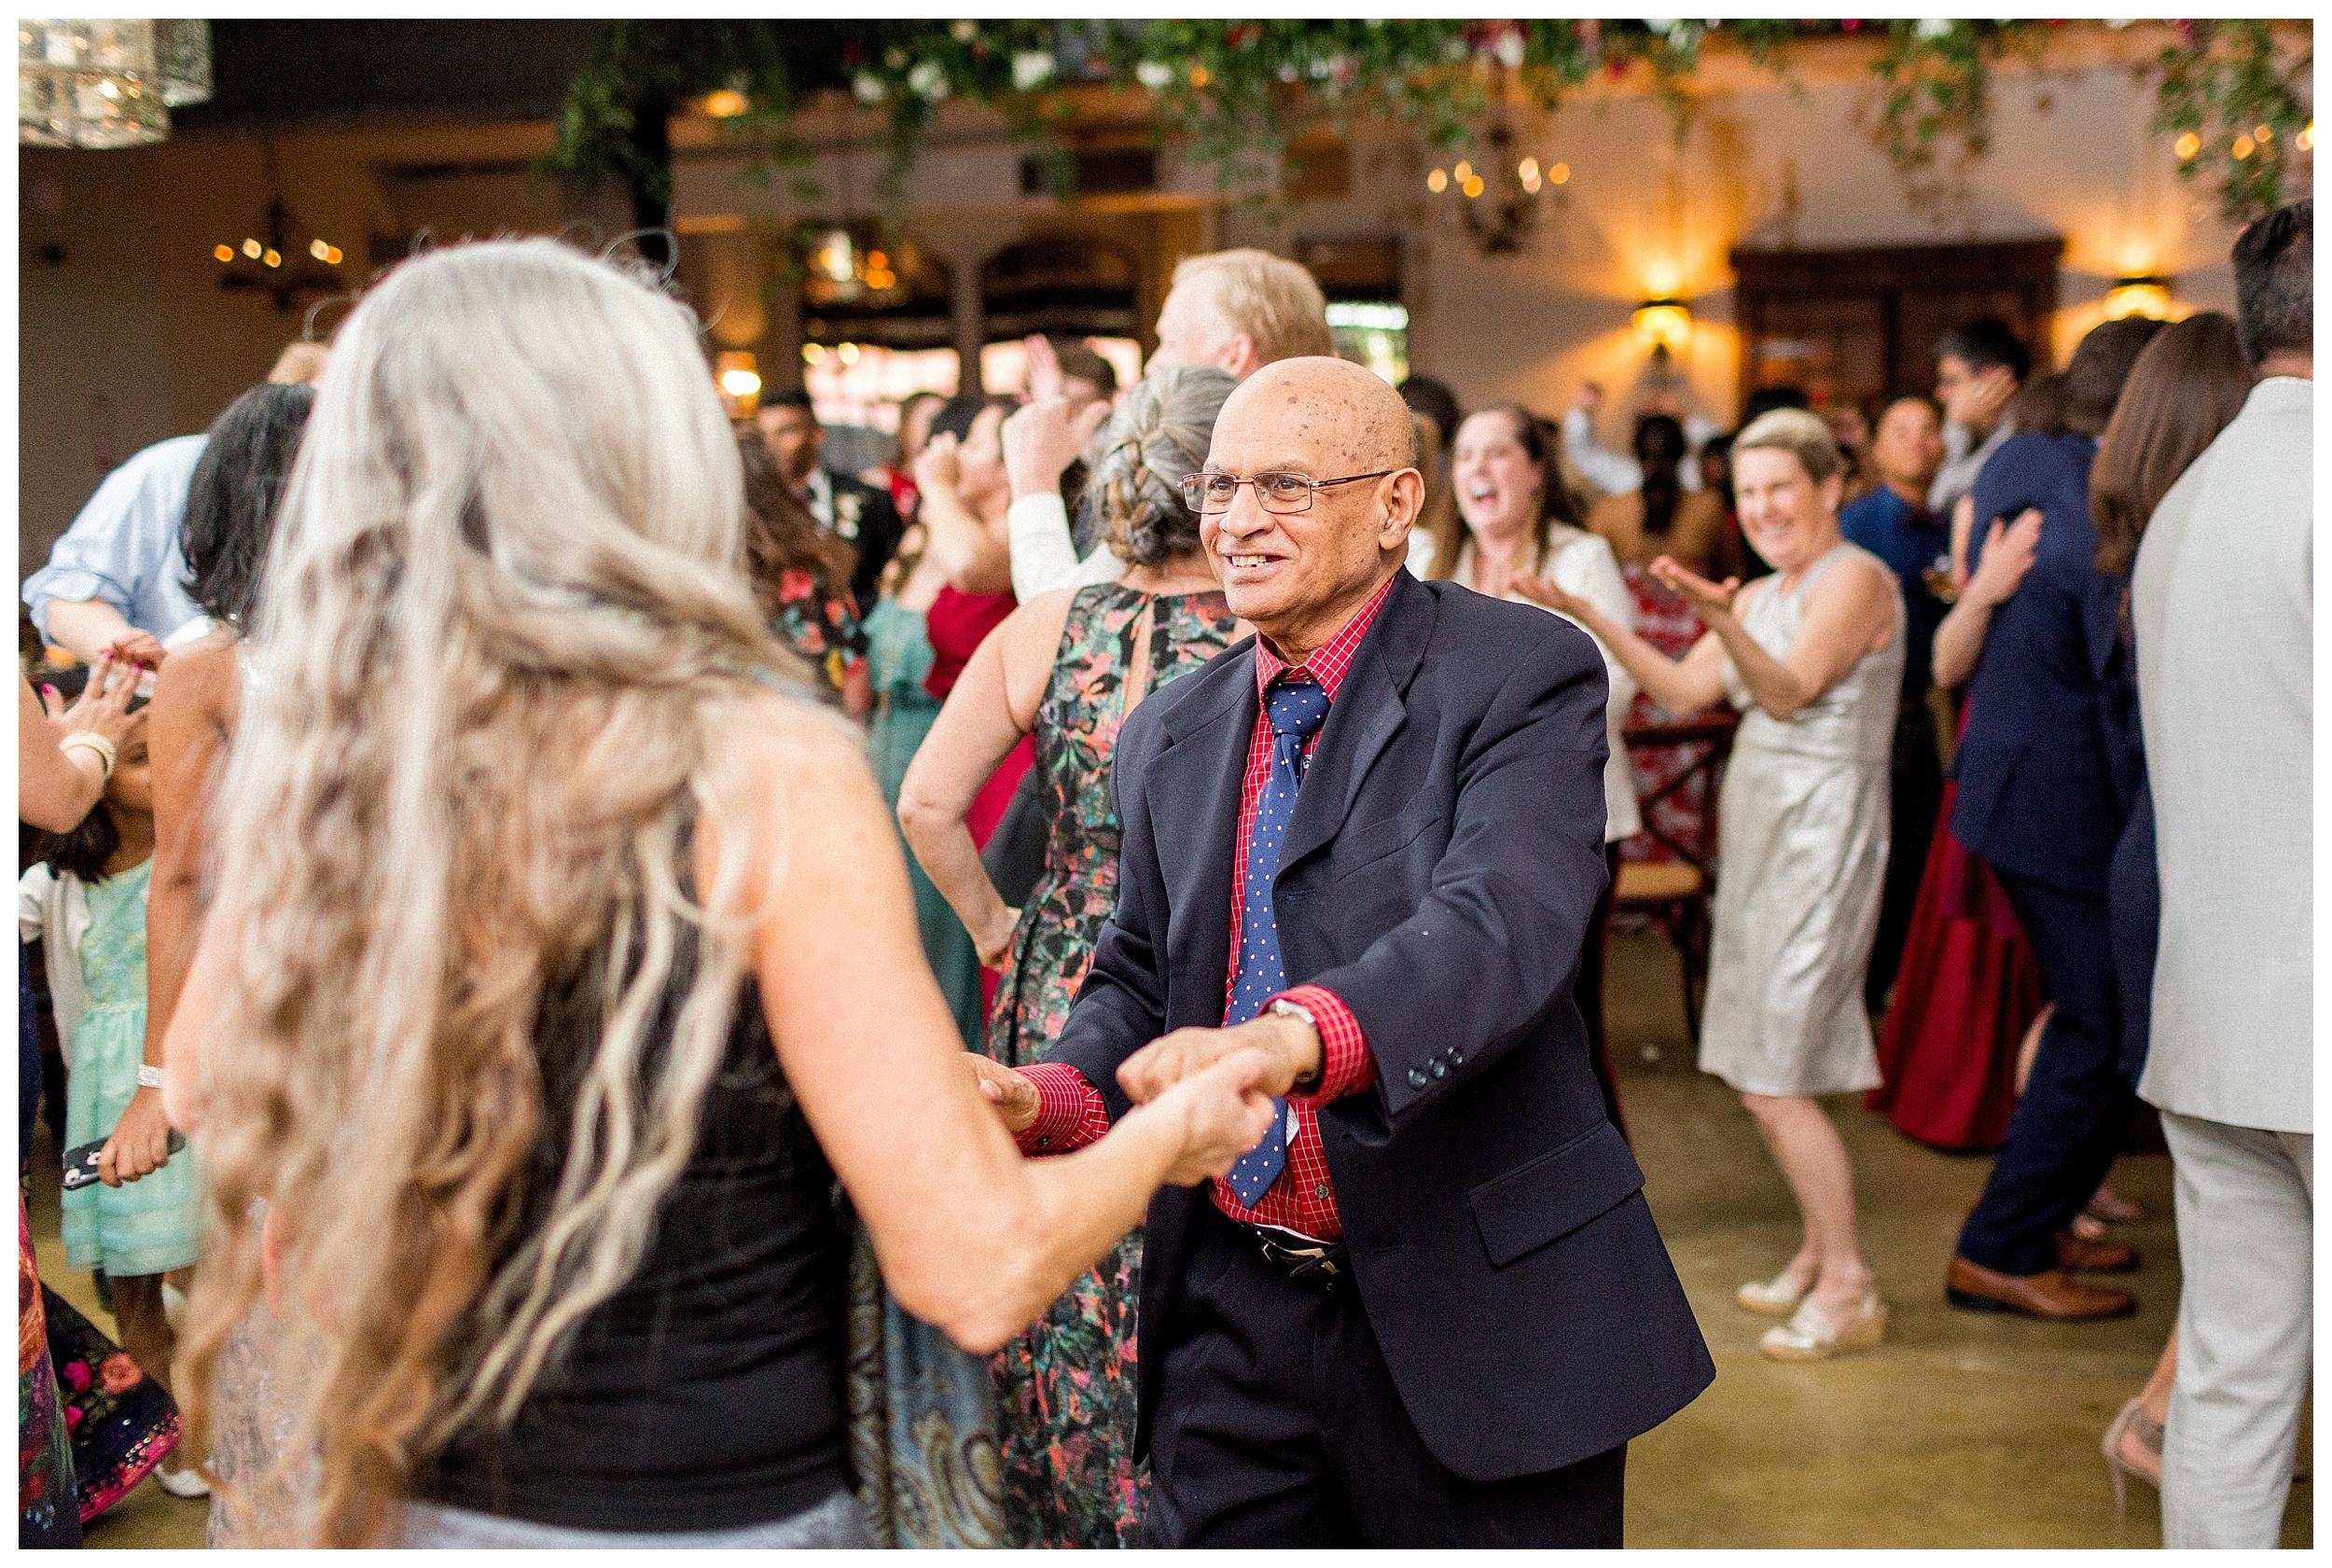 Stone Tower Winery Wedding | Virginia Winter Wedding | VA Wedding Photographer Kir Tuben_0112.jpg